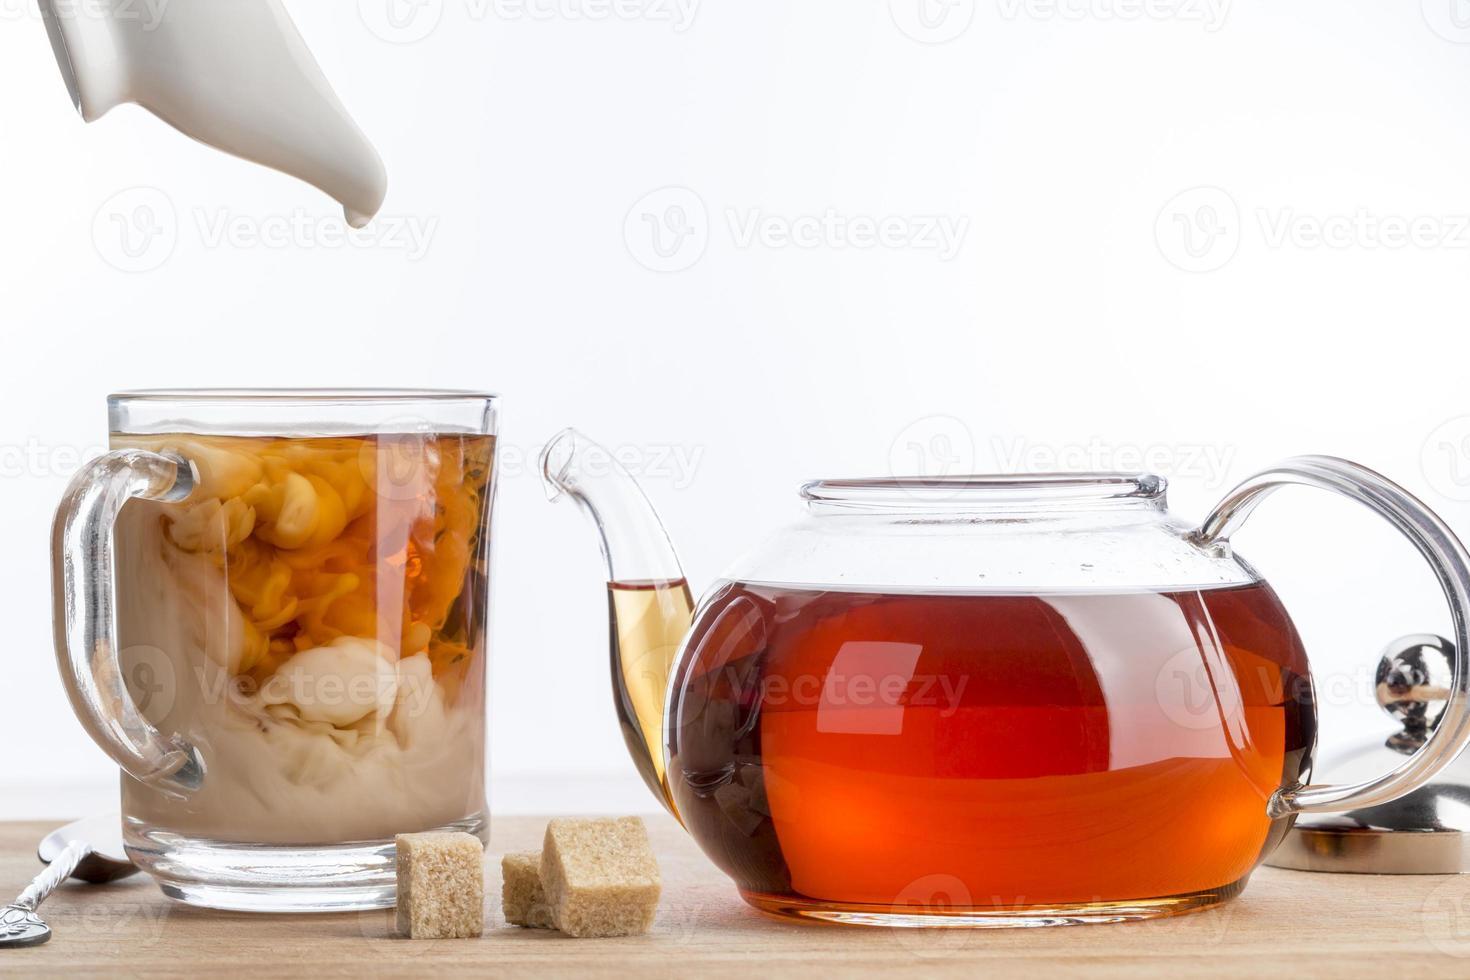 los melk op in een kopje zwarte thee. foto